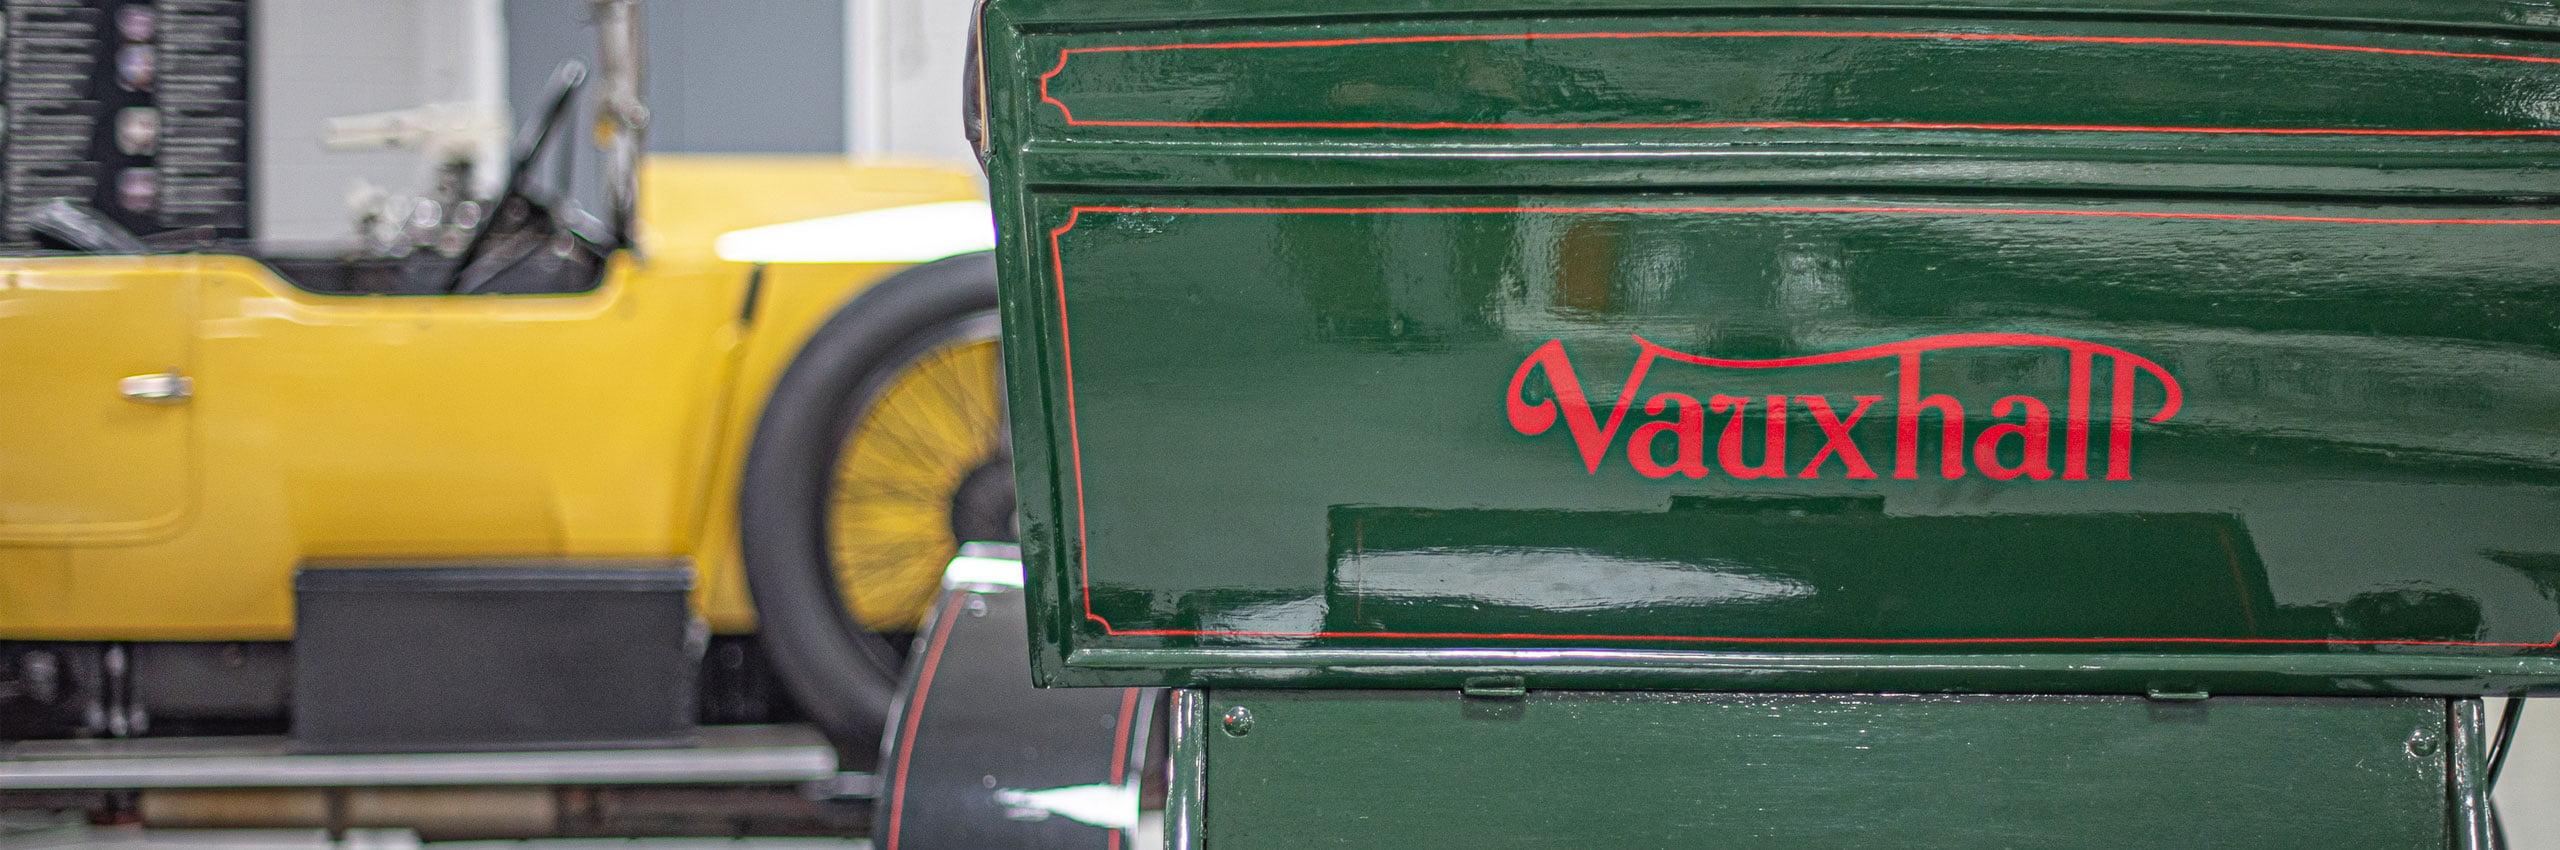 Vauxhall at Manor Park